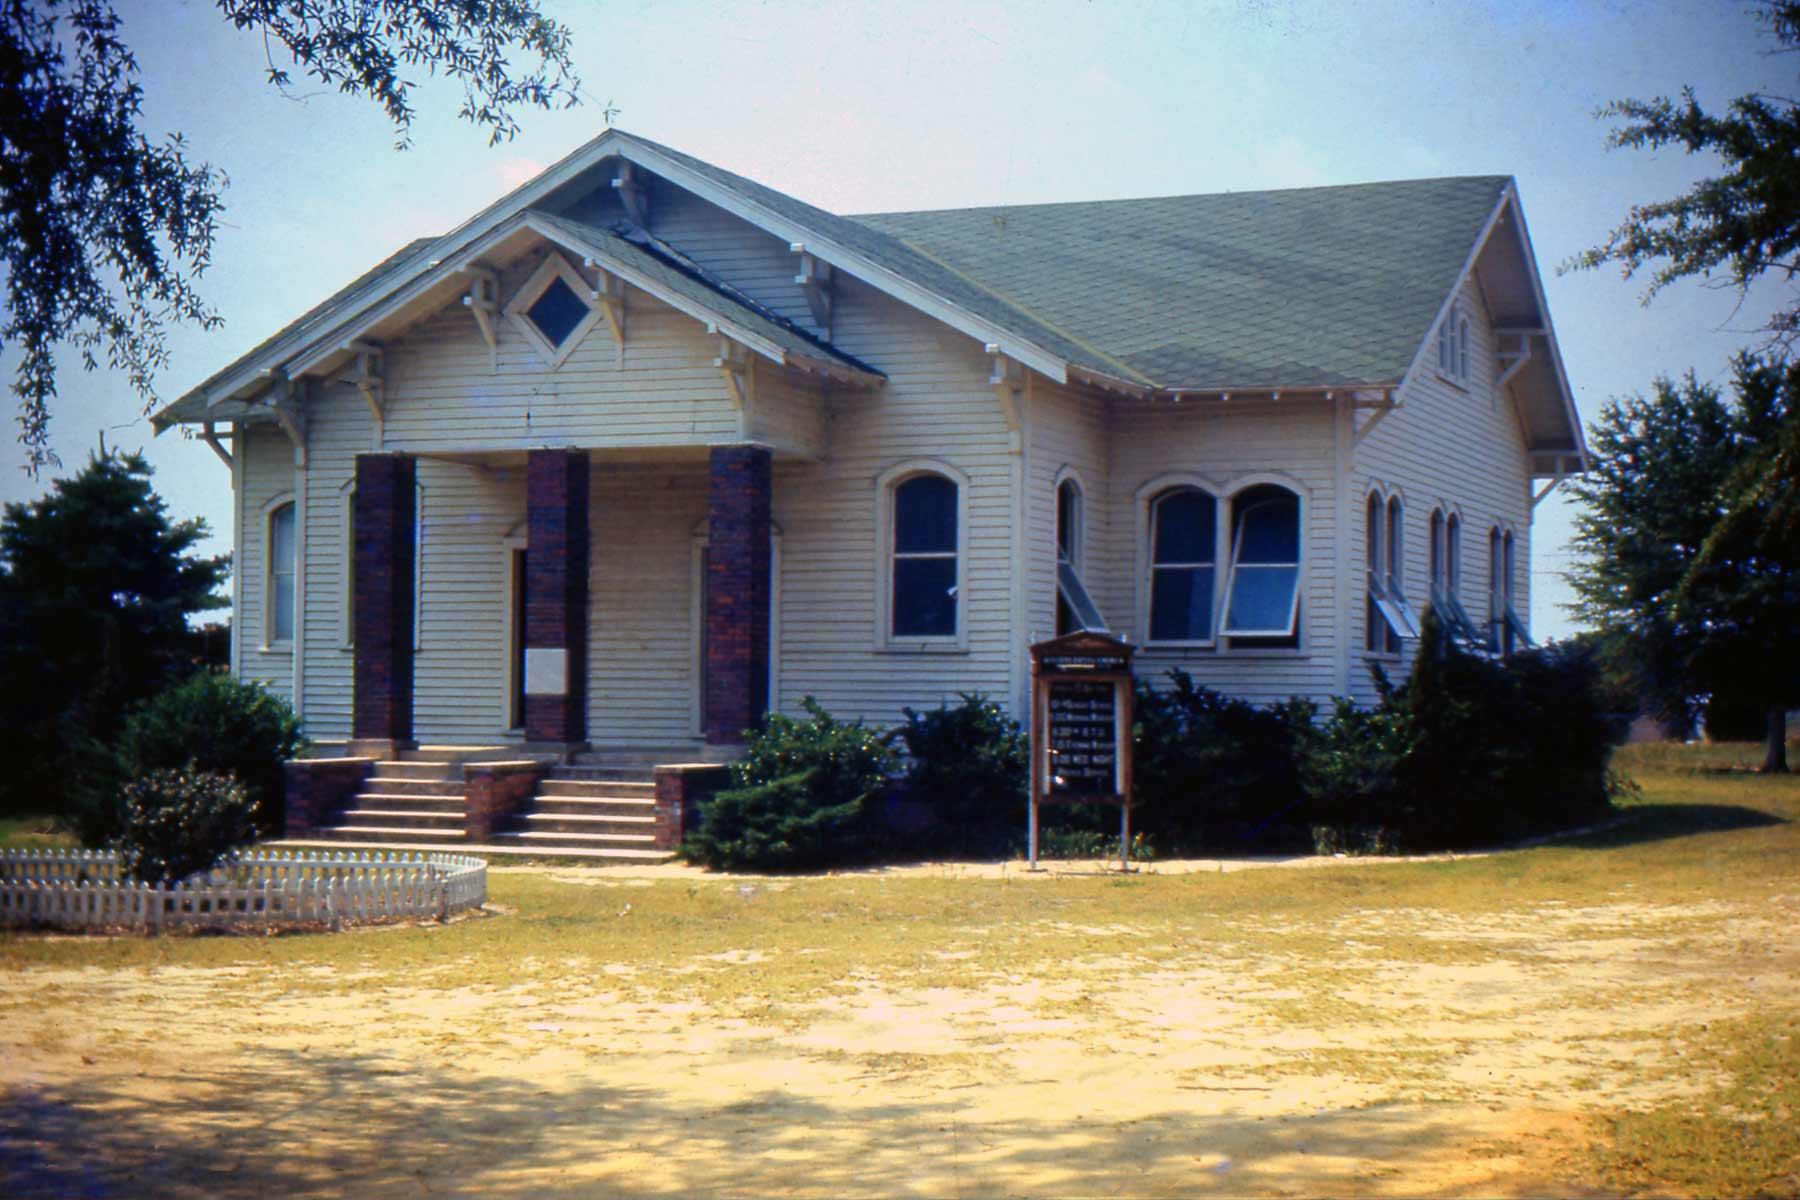 Kelleytown Baptist in Hartsville, Original Church